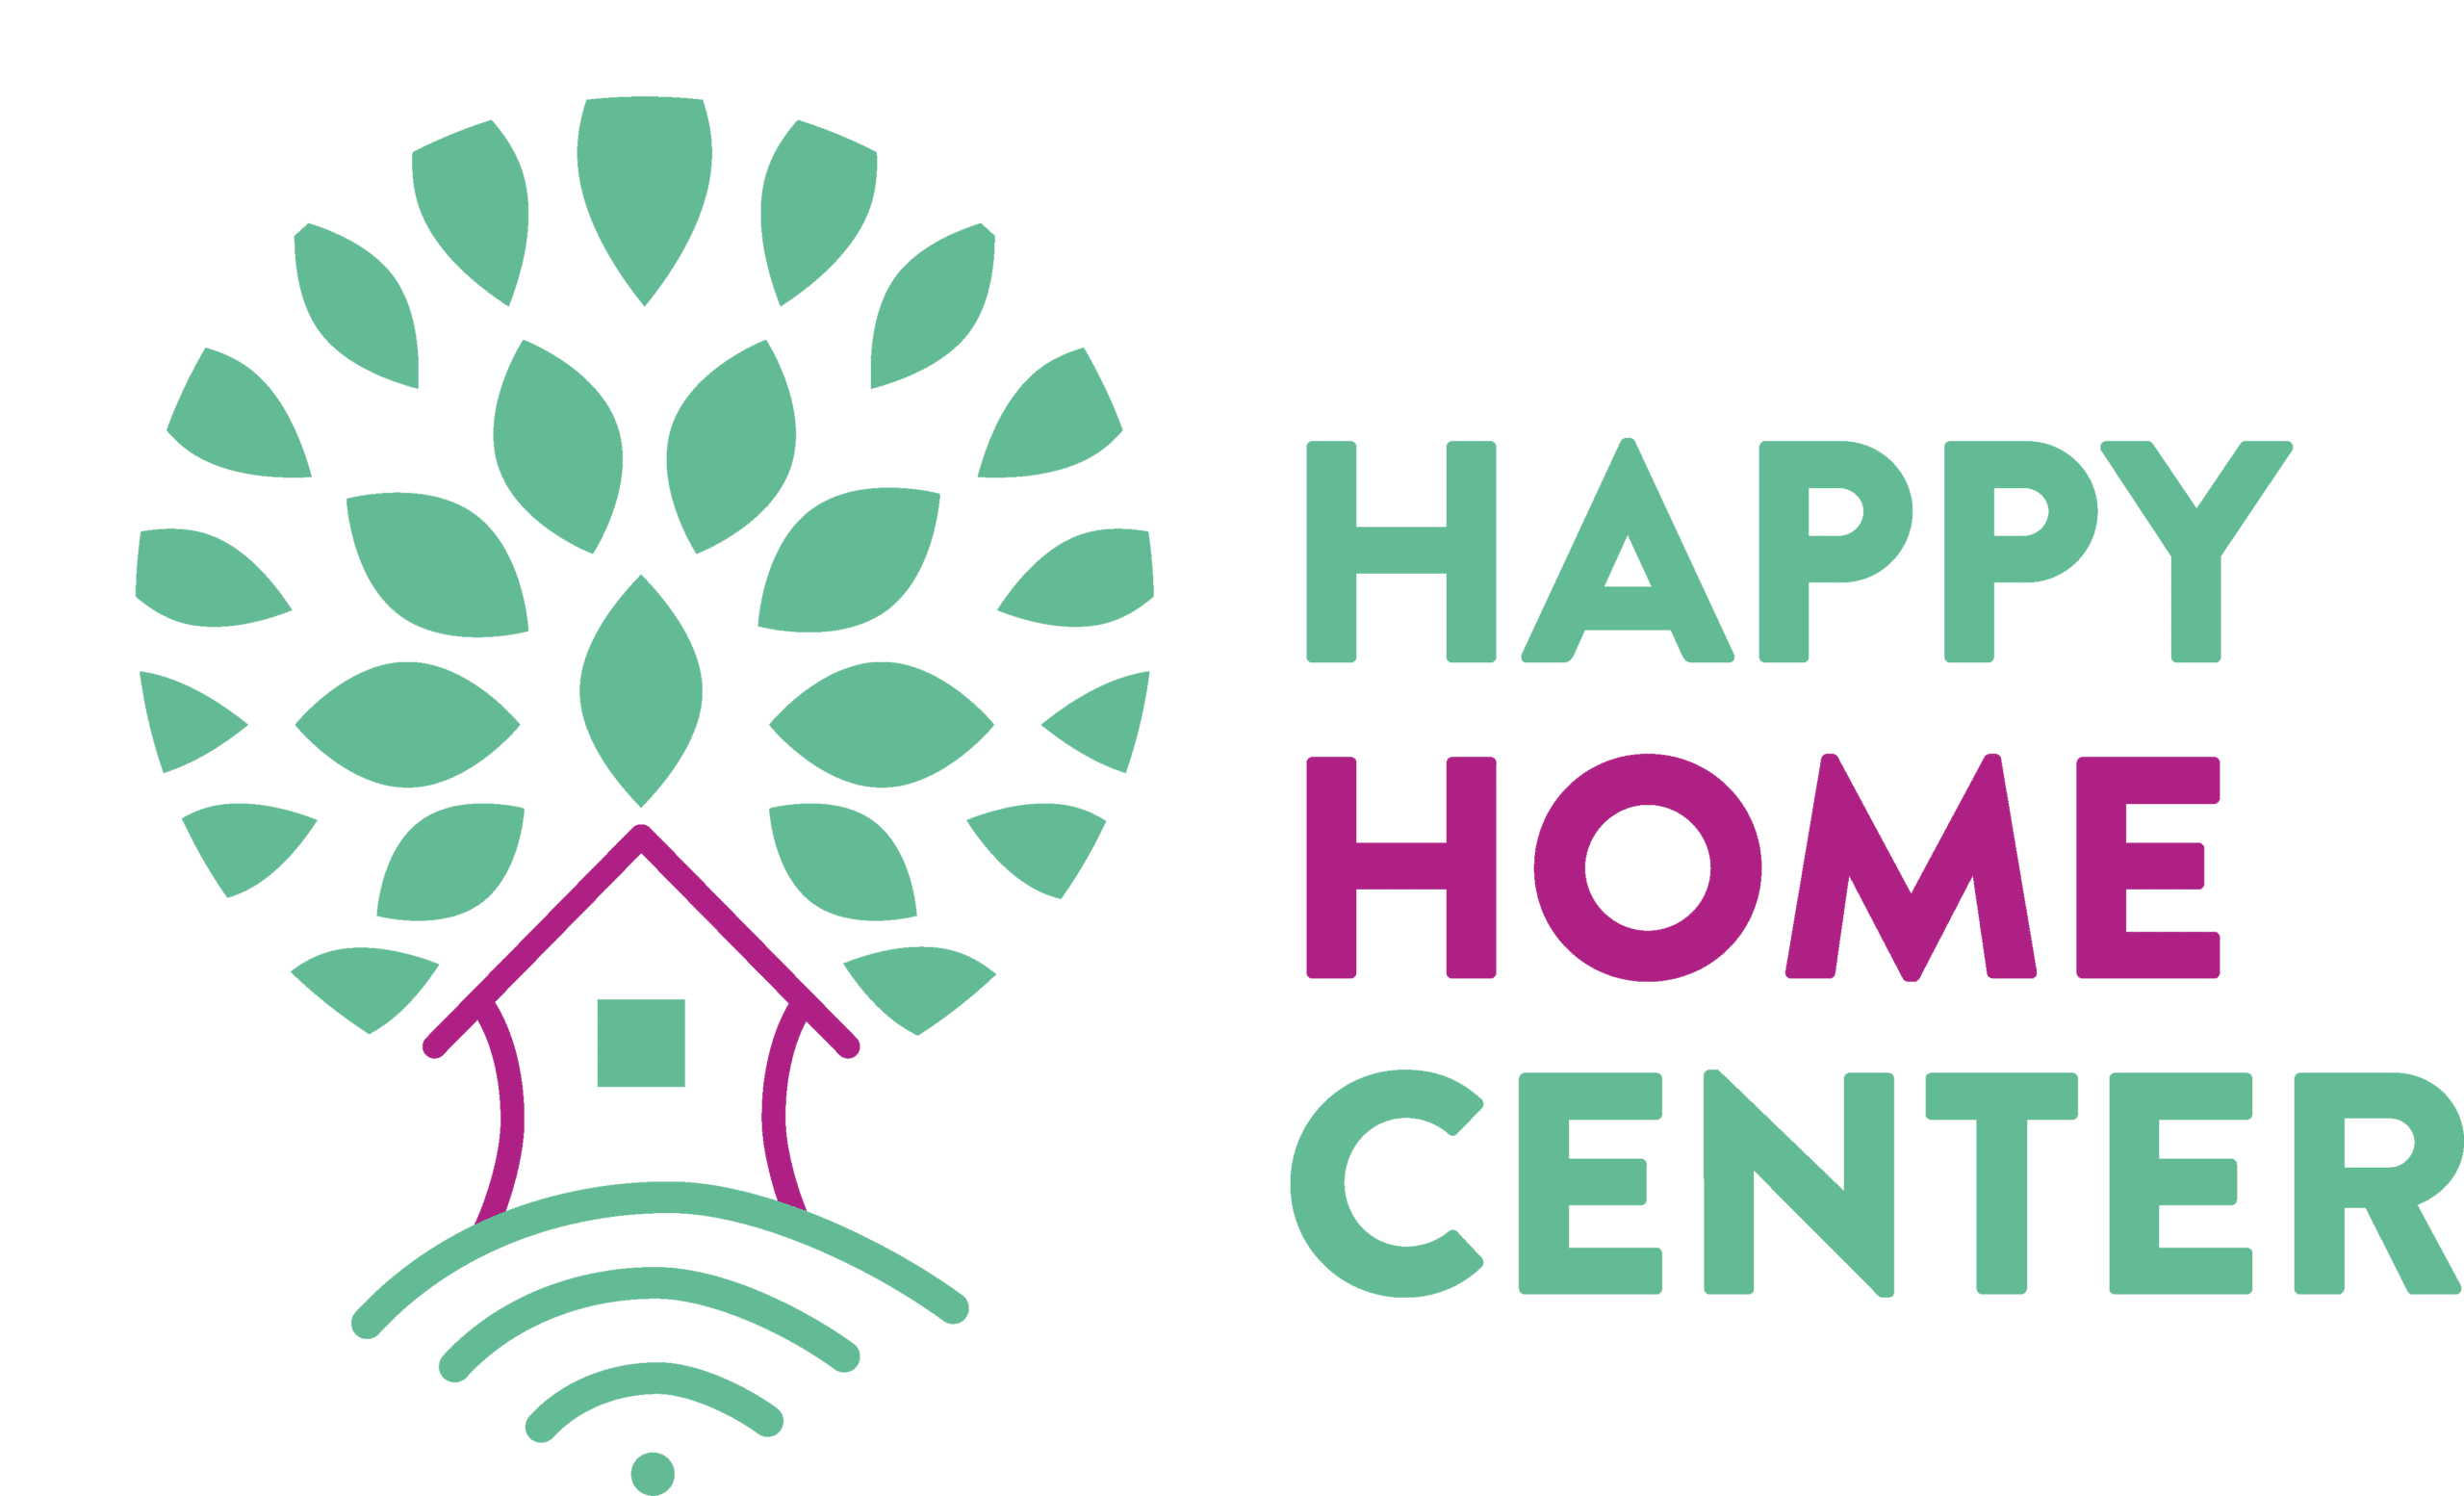 Happy Home Center